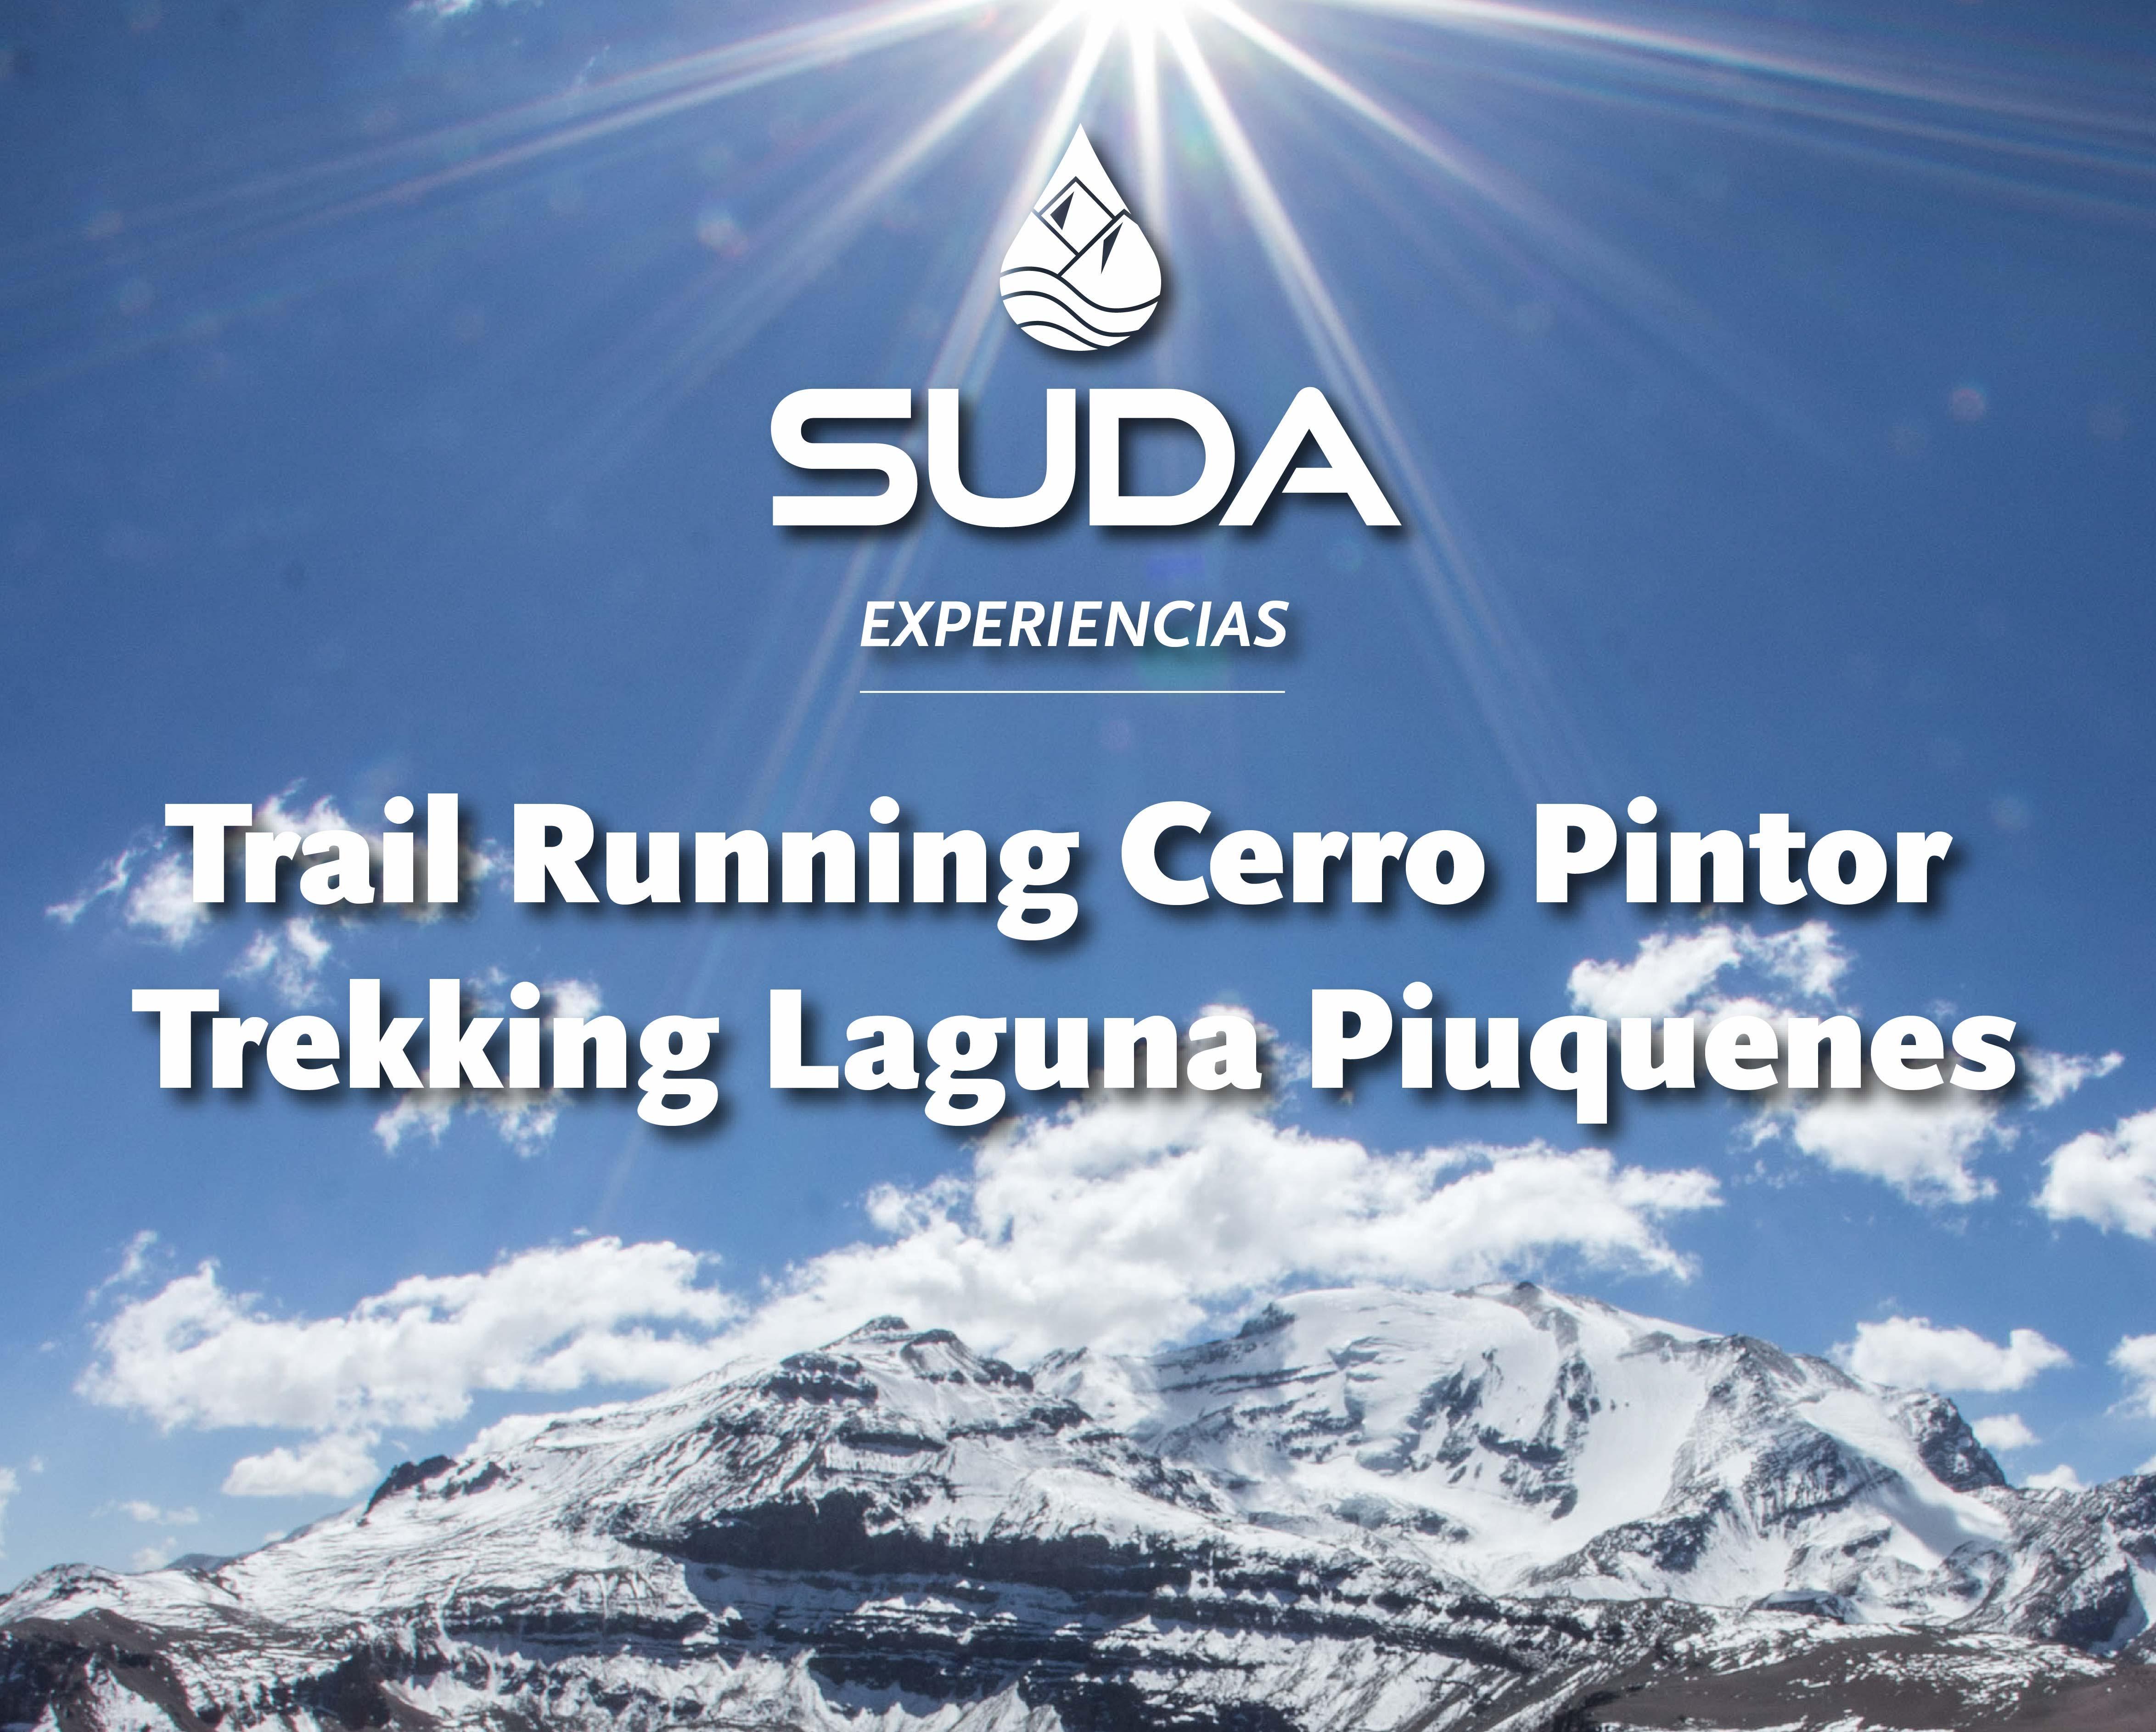 Experiencia SUDA: Cerro Pintor / Laguna Piuquenes